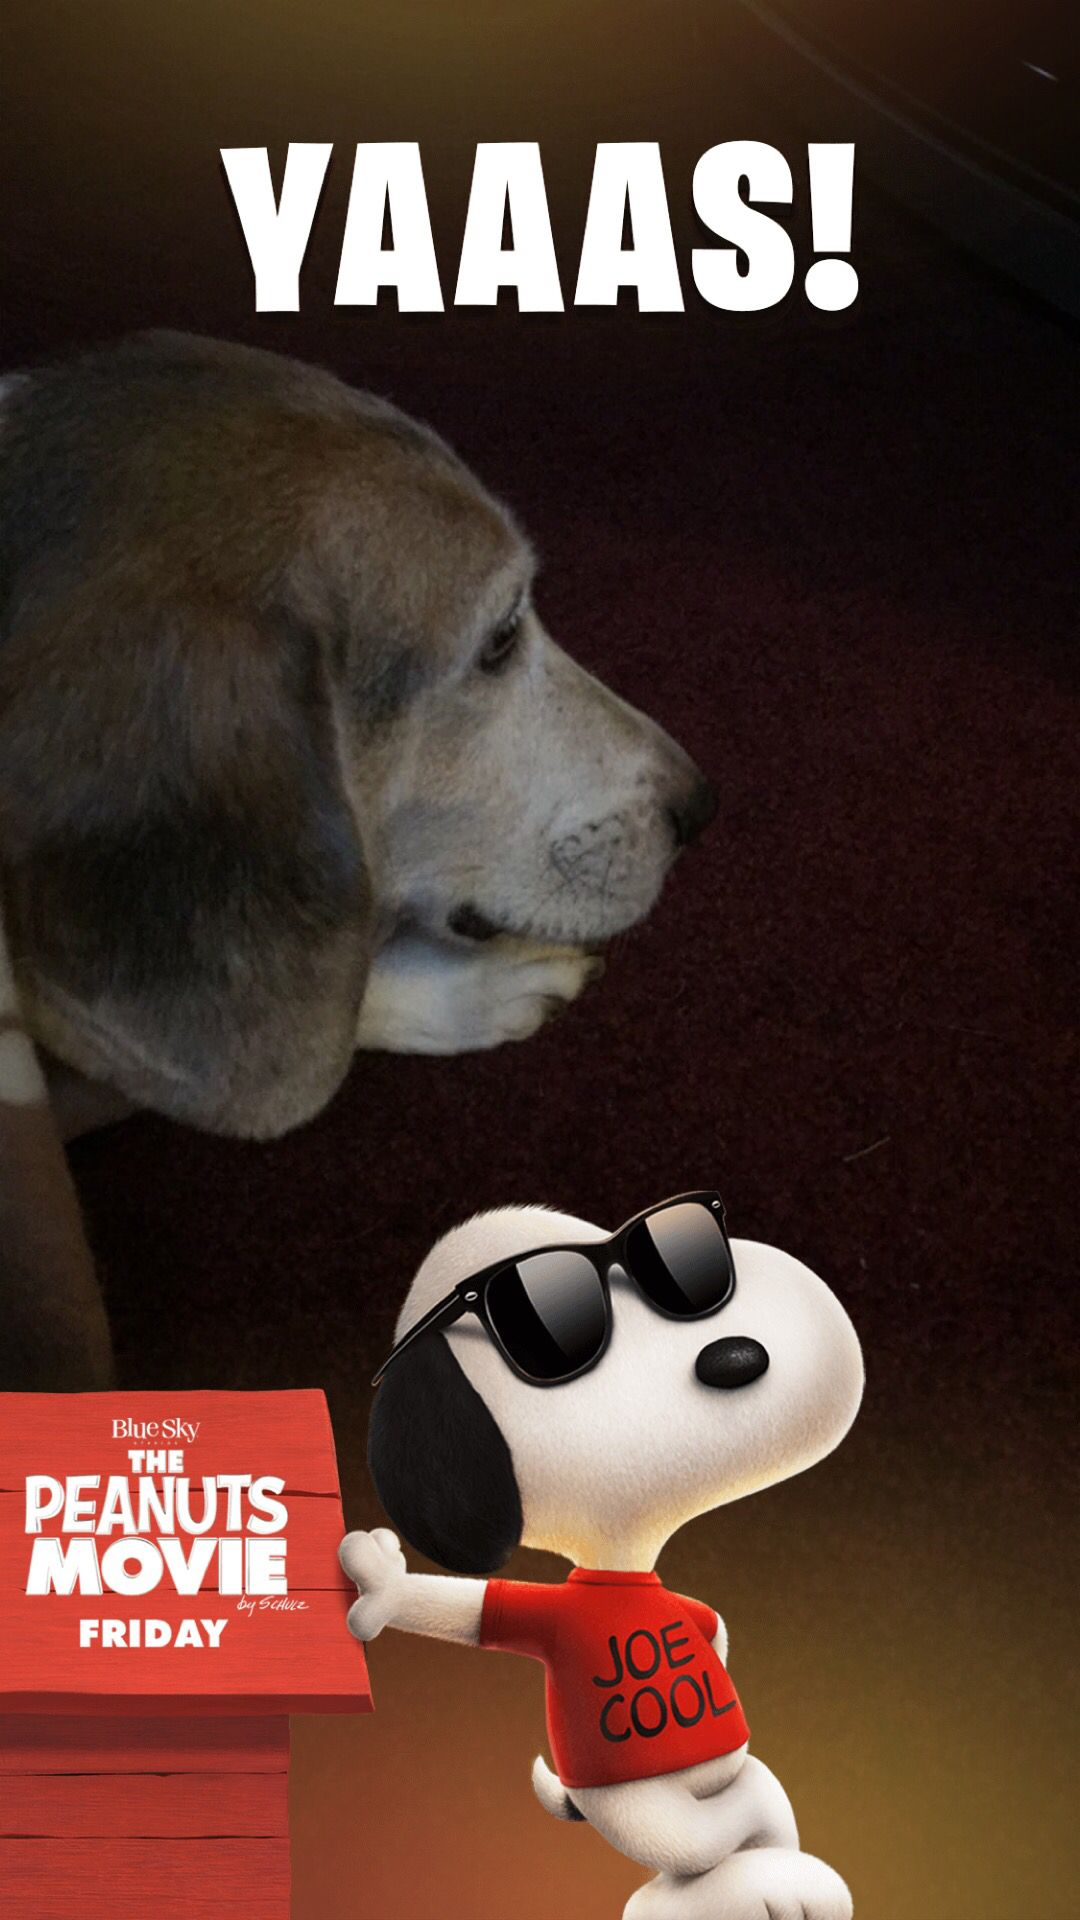 My Angel Chewy Beagle Peanuts Movie Snoopy